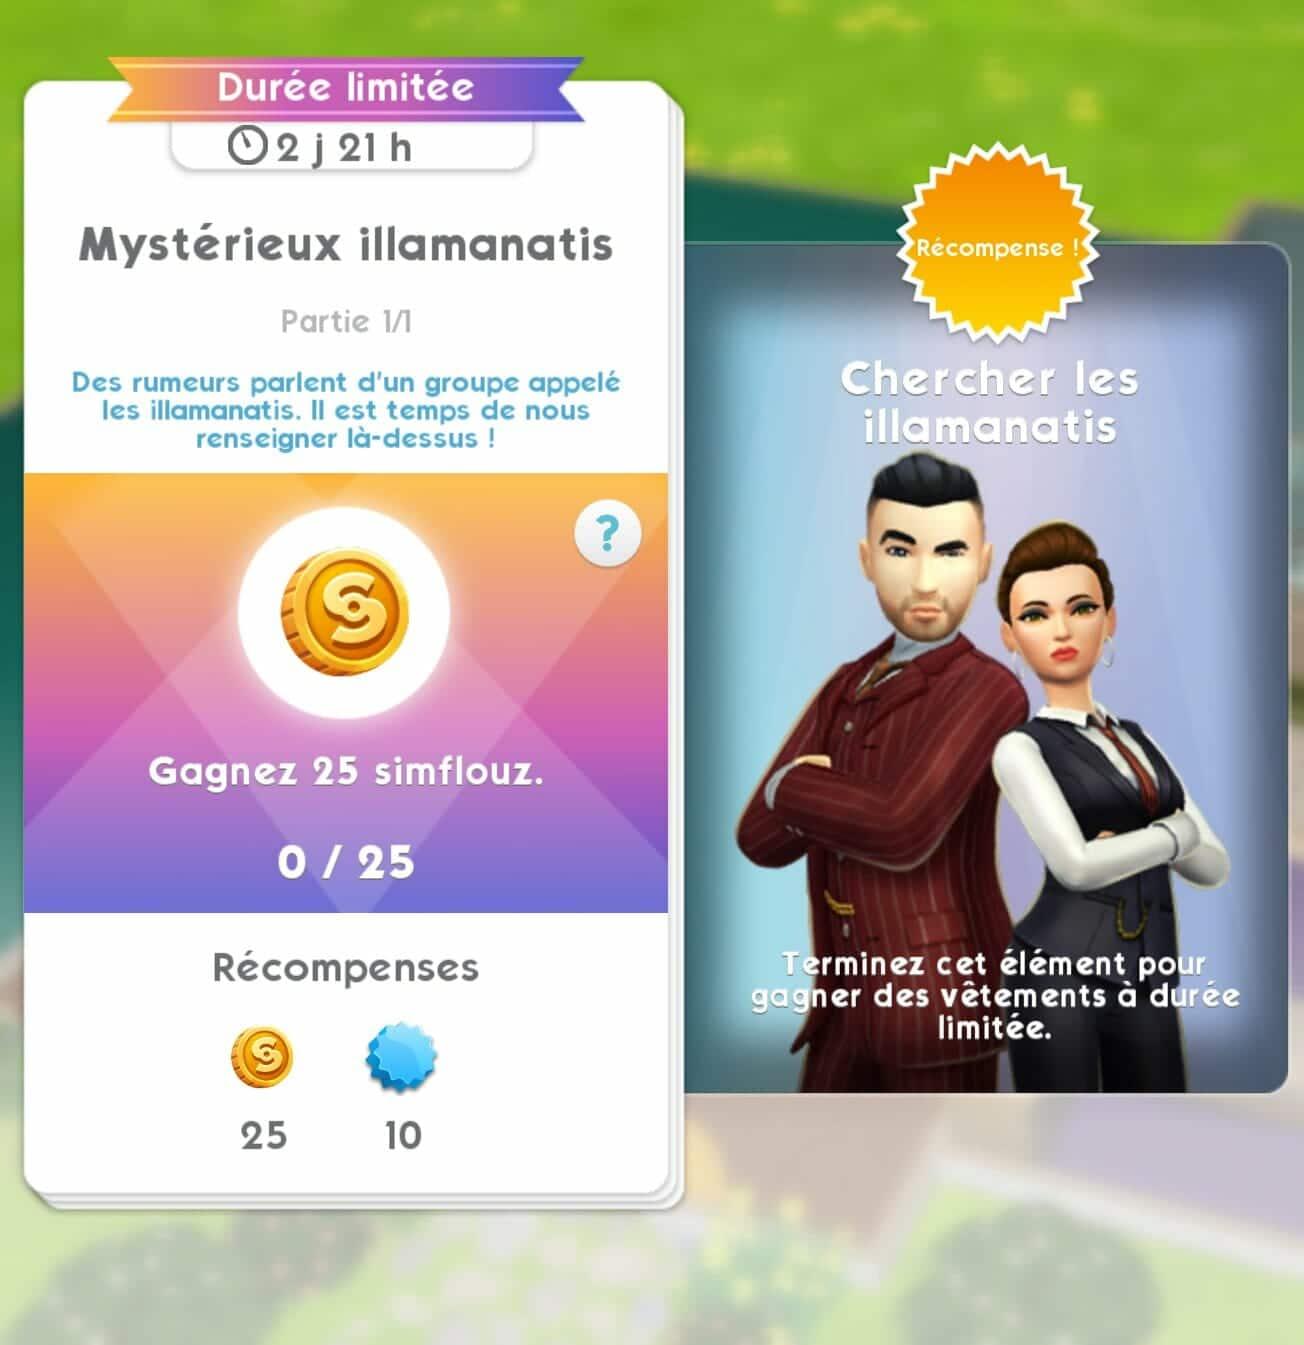 Les Sims Mobile : La quête Illamanatis